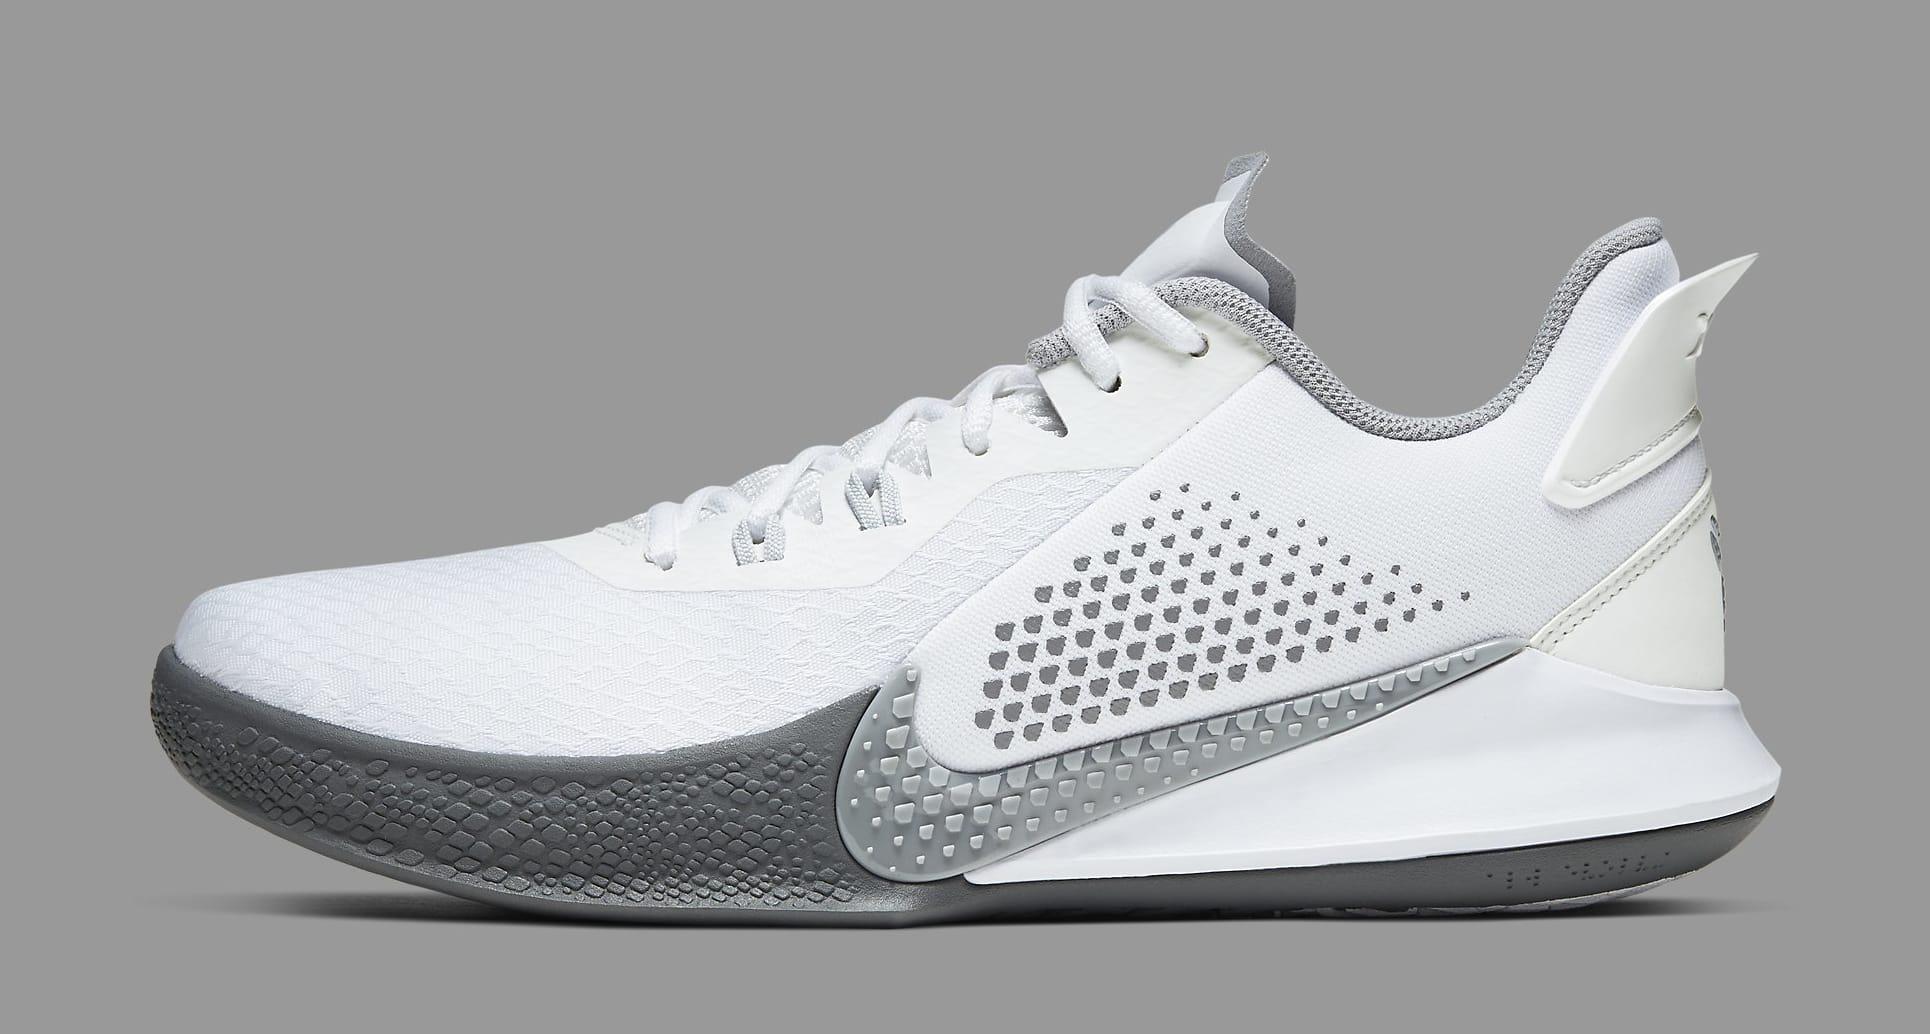 Nike Kobe Mamba Fury CK2087-100 Lateral